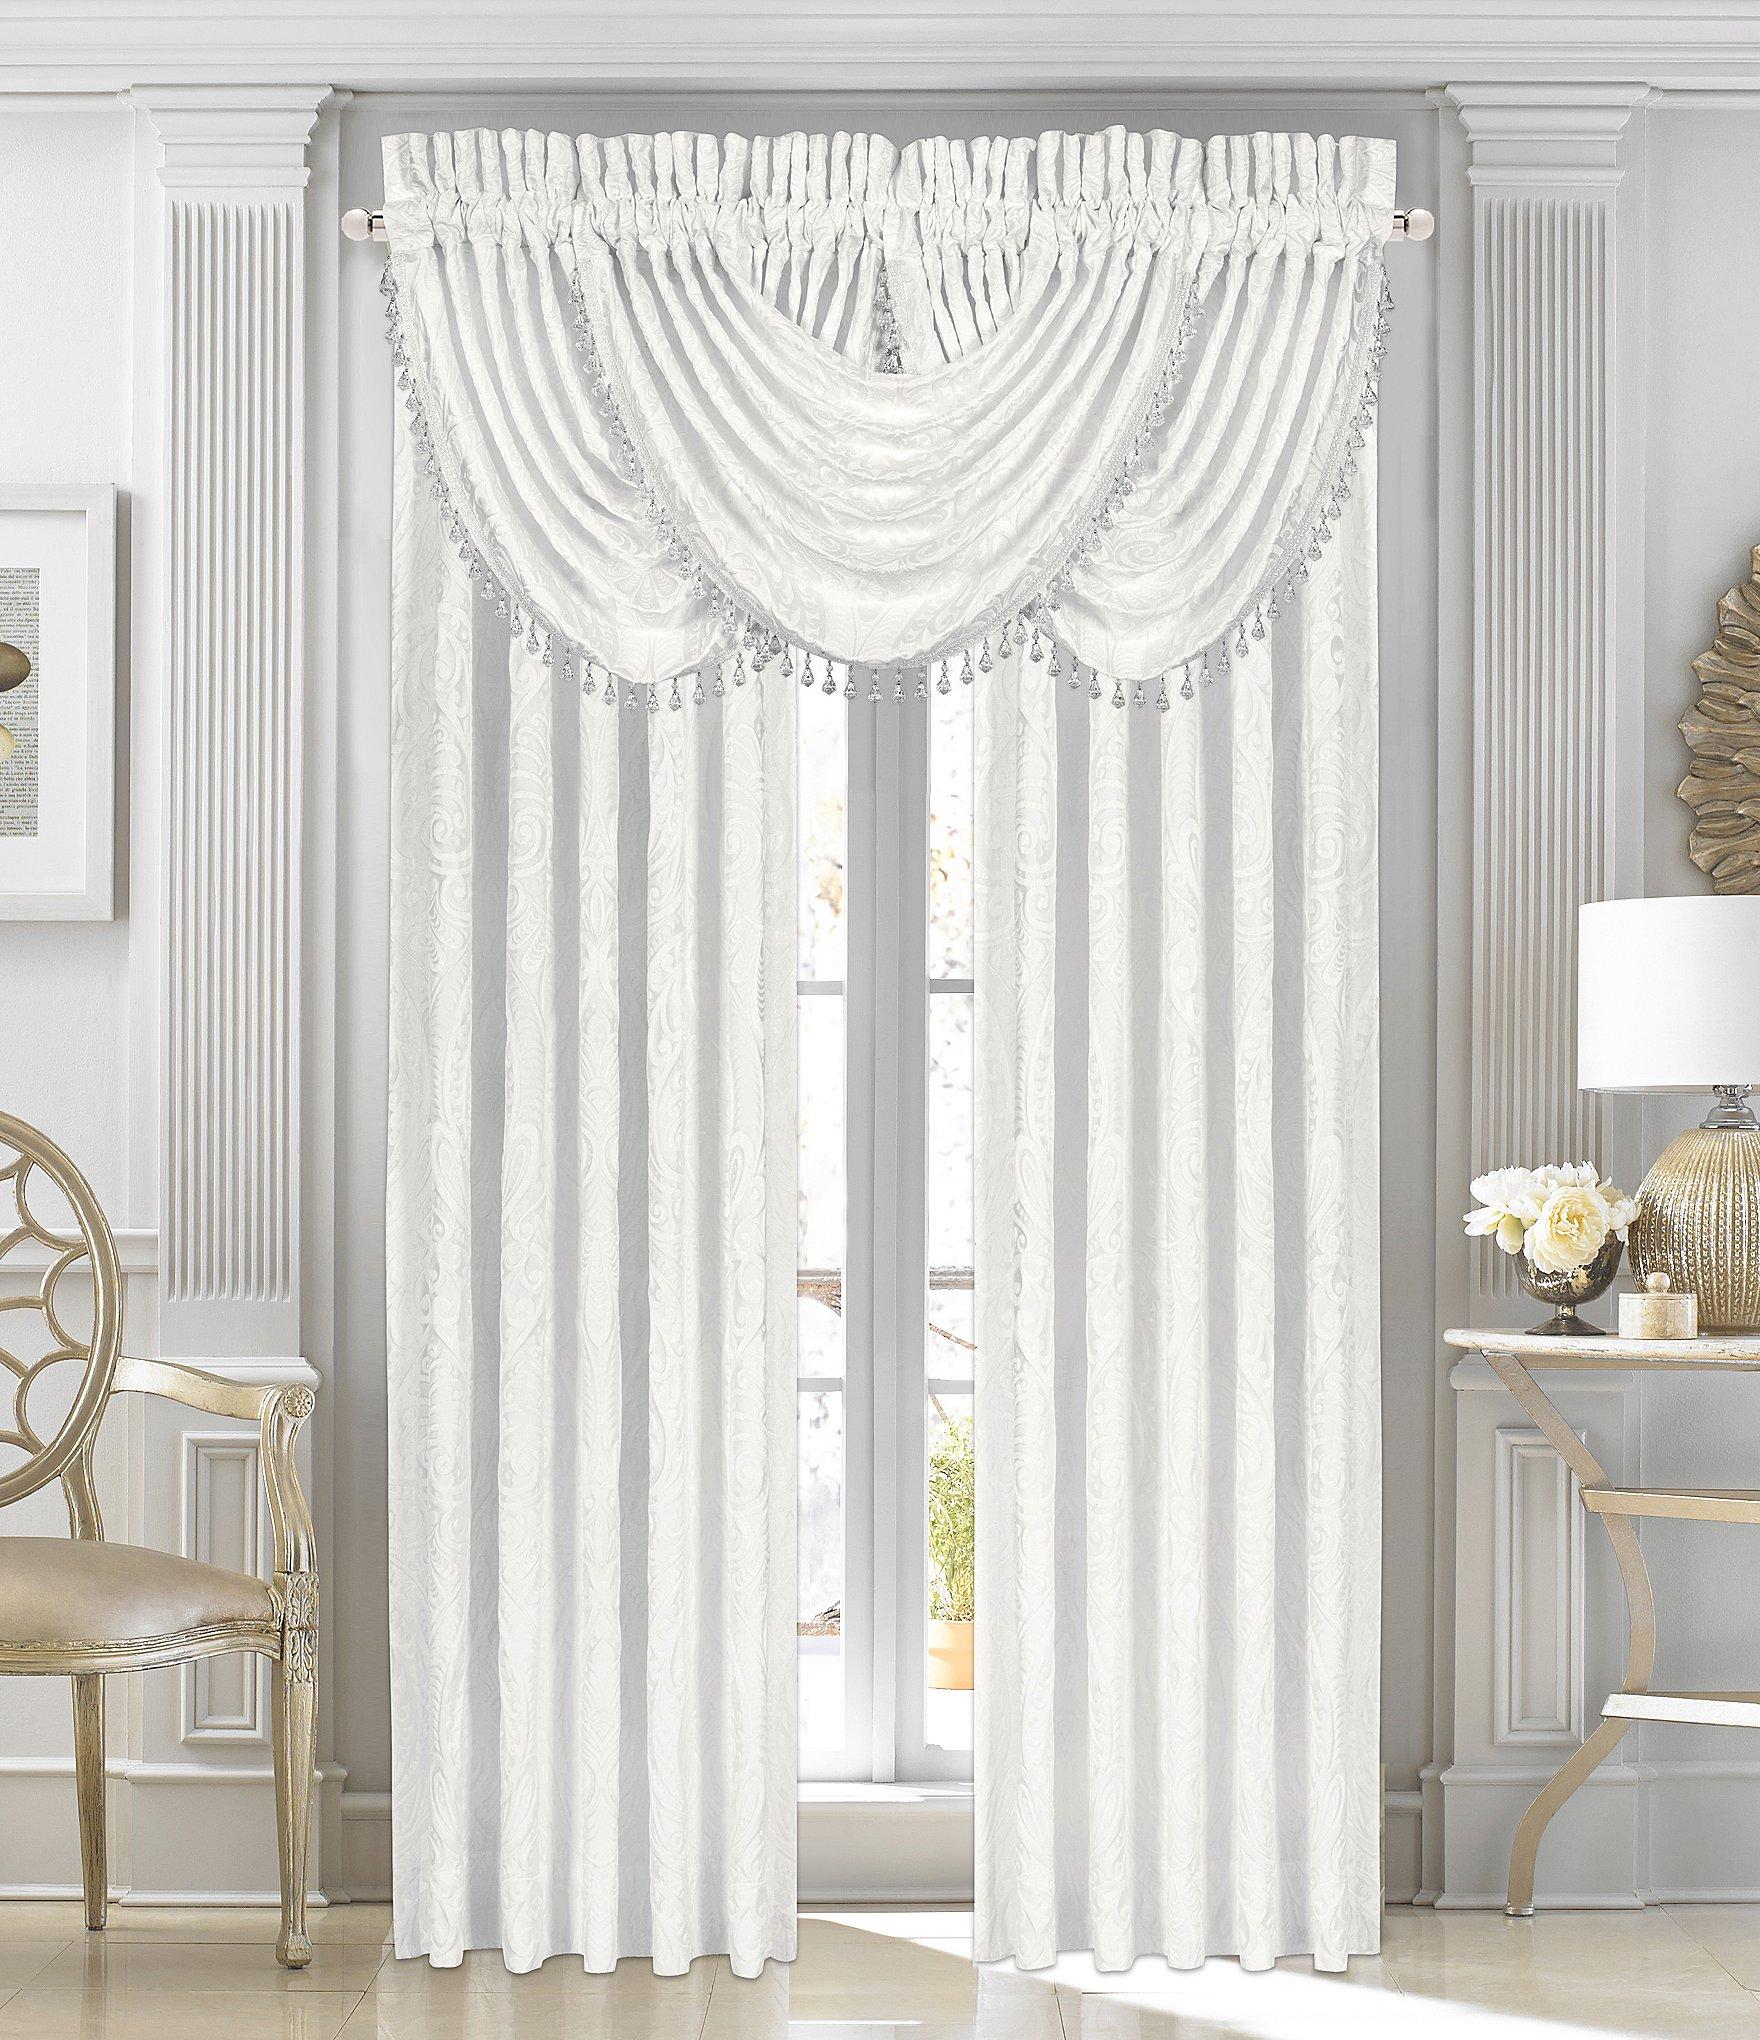 Window Treatments Curtains Drapes Valances